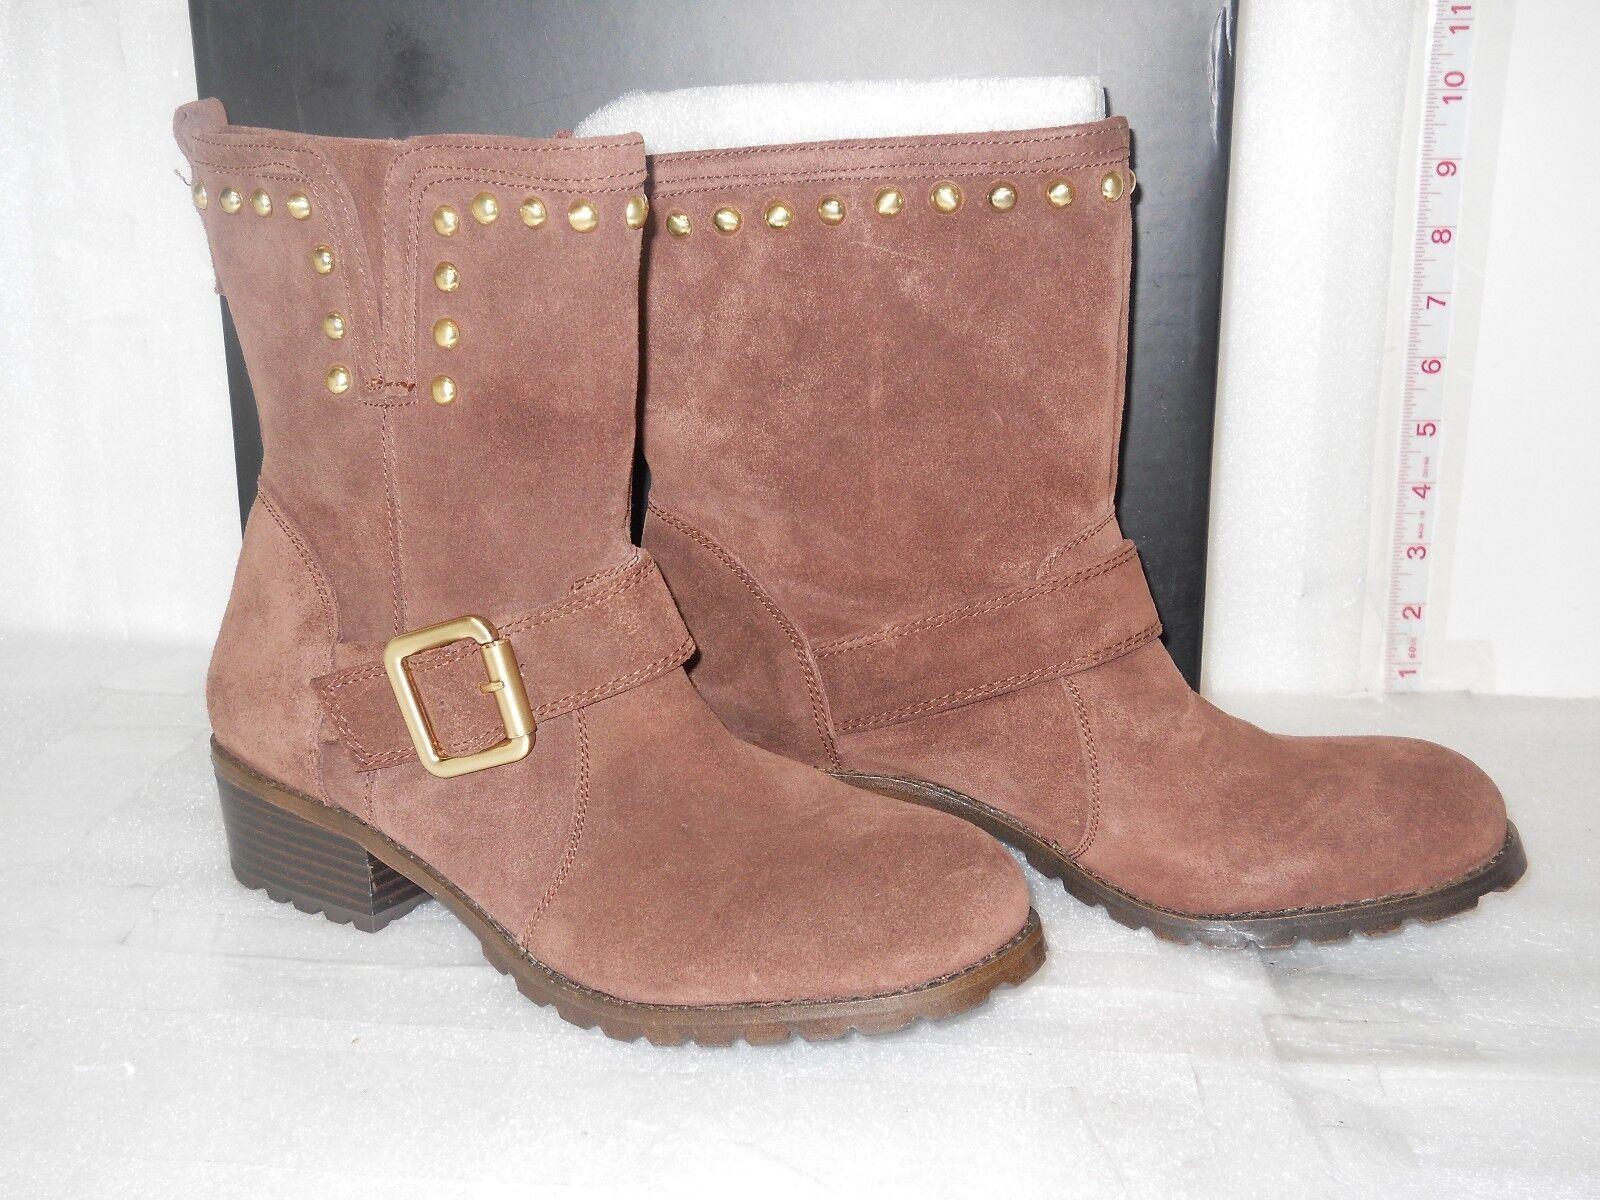 INC International Concepts Damenschuhe Henry Nutmeg Braun Braun Braun Fashion Stiefel 10 M Schuhes f31abe